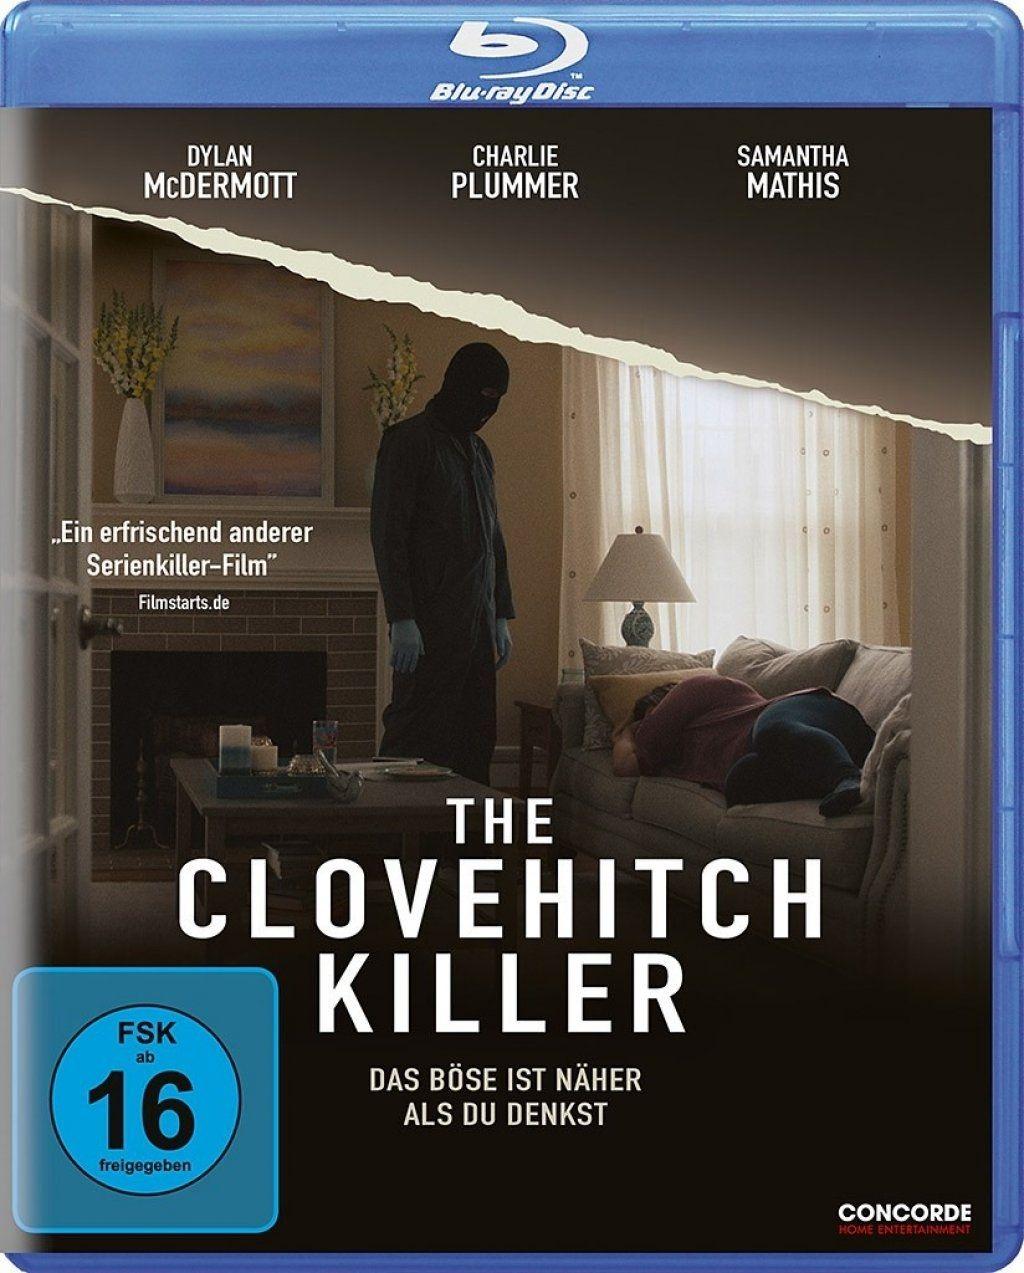 Clovehitch Killer, The (BLURAY)